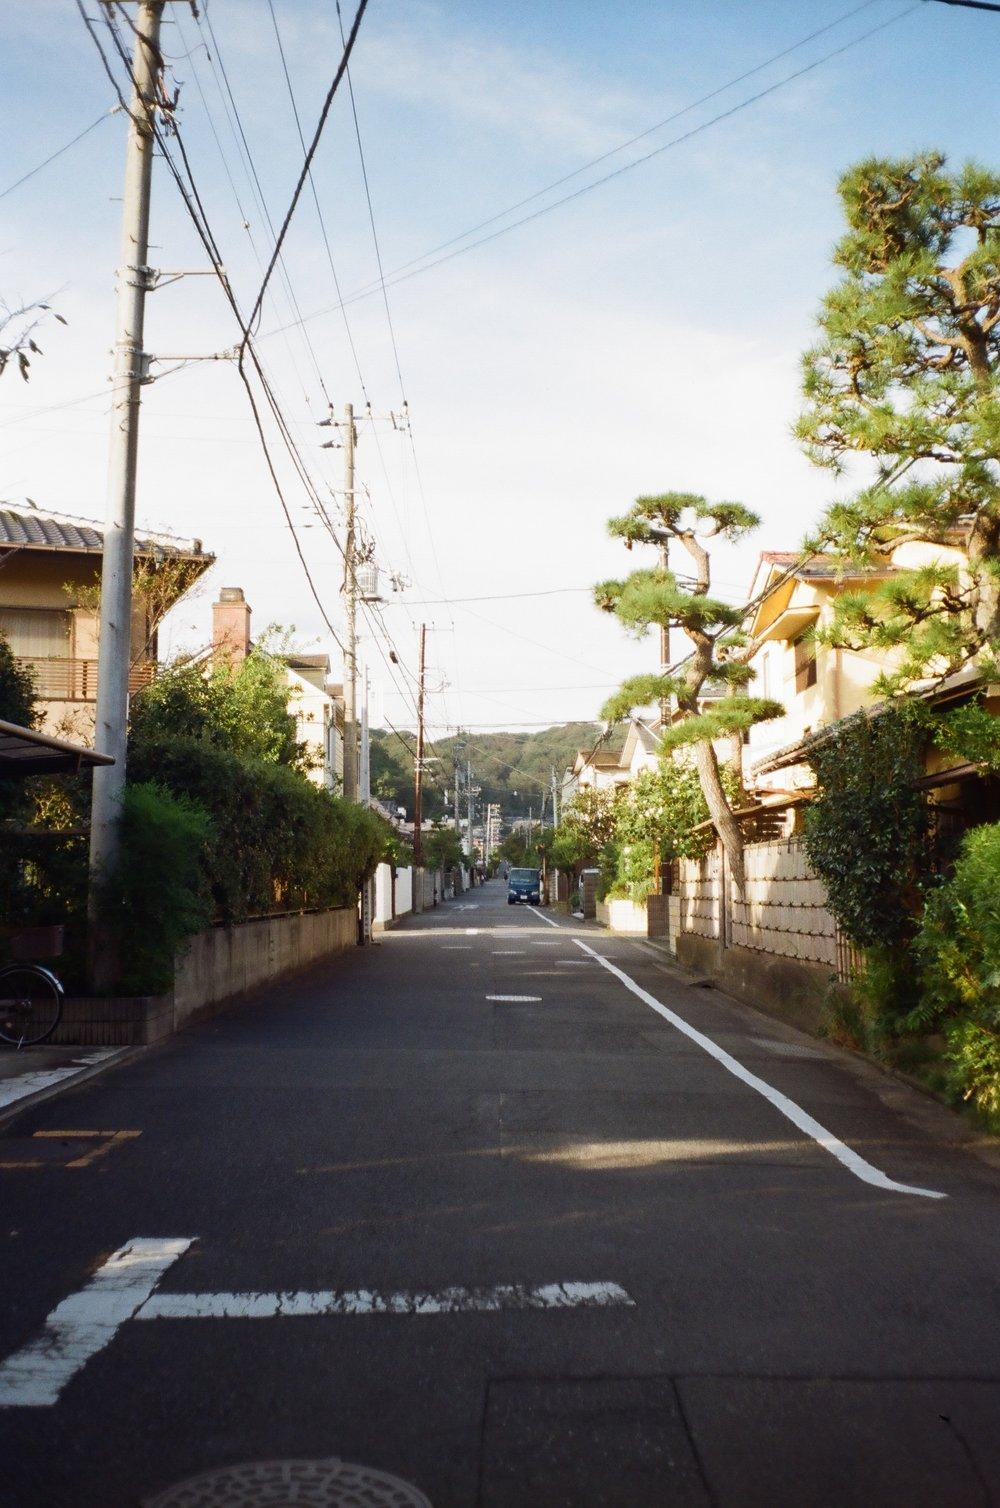 08-JAPON-argentic-Kamakura-octobre-2016-0016.jpg